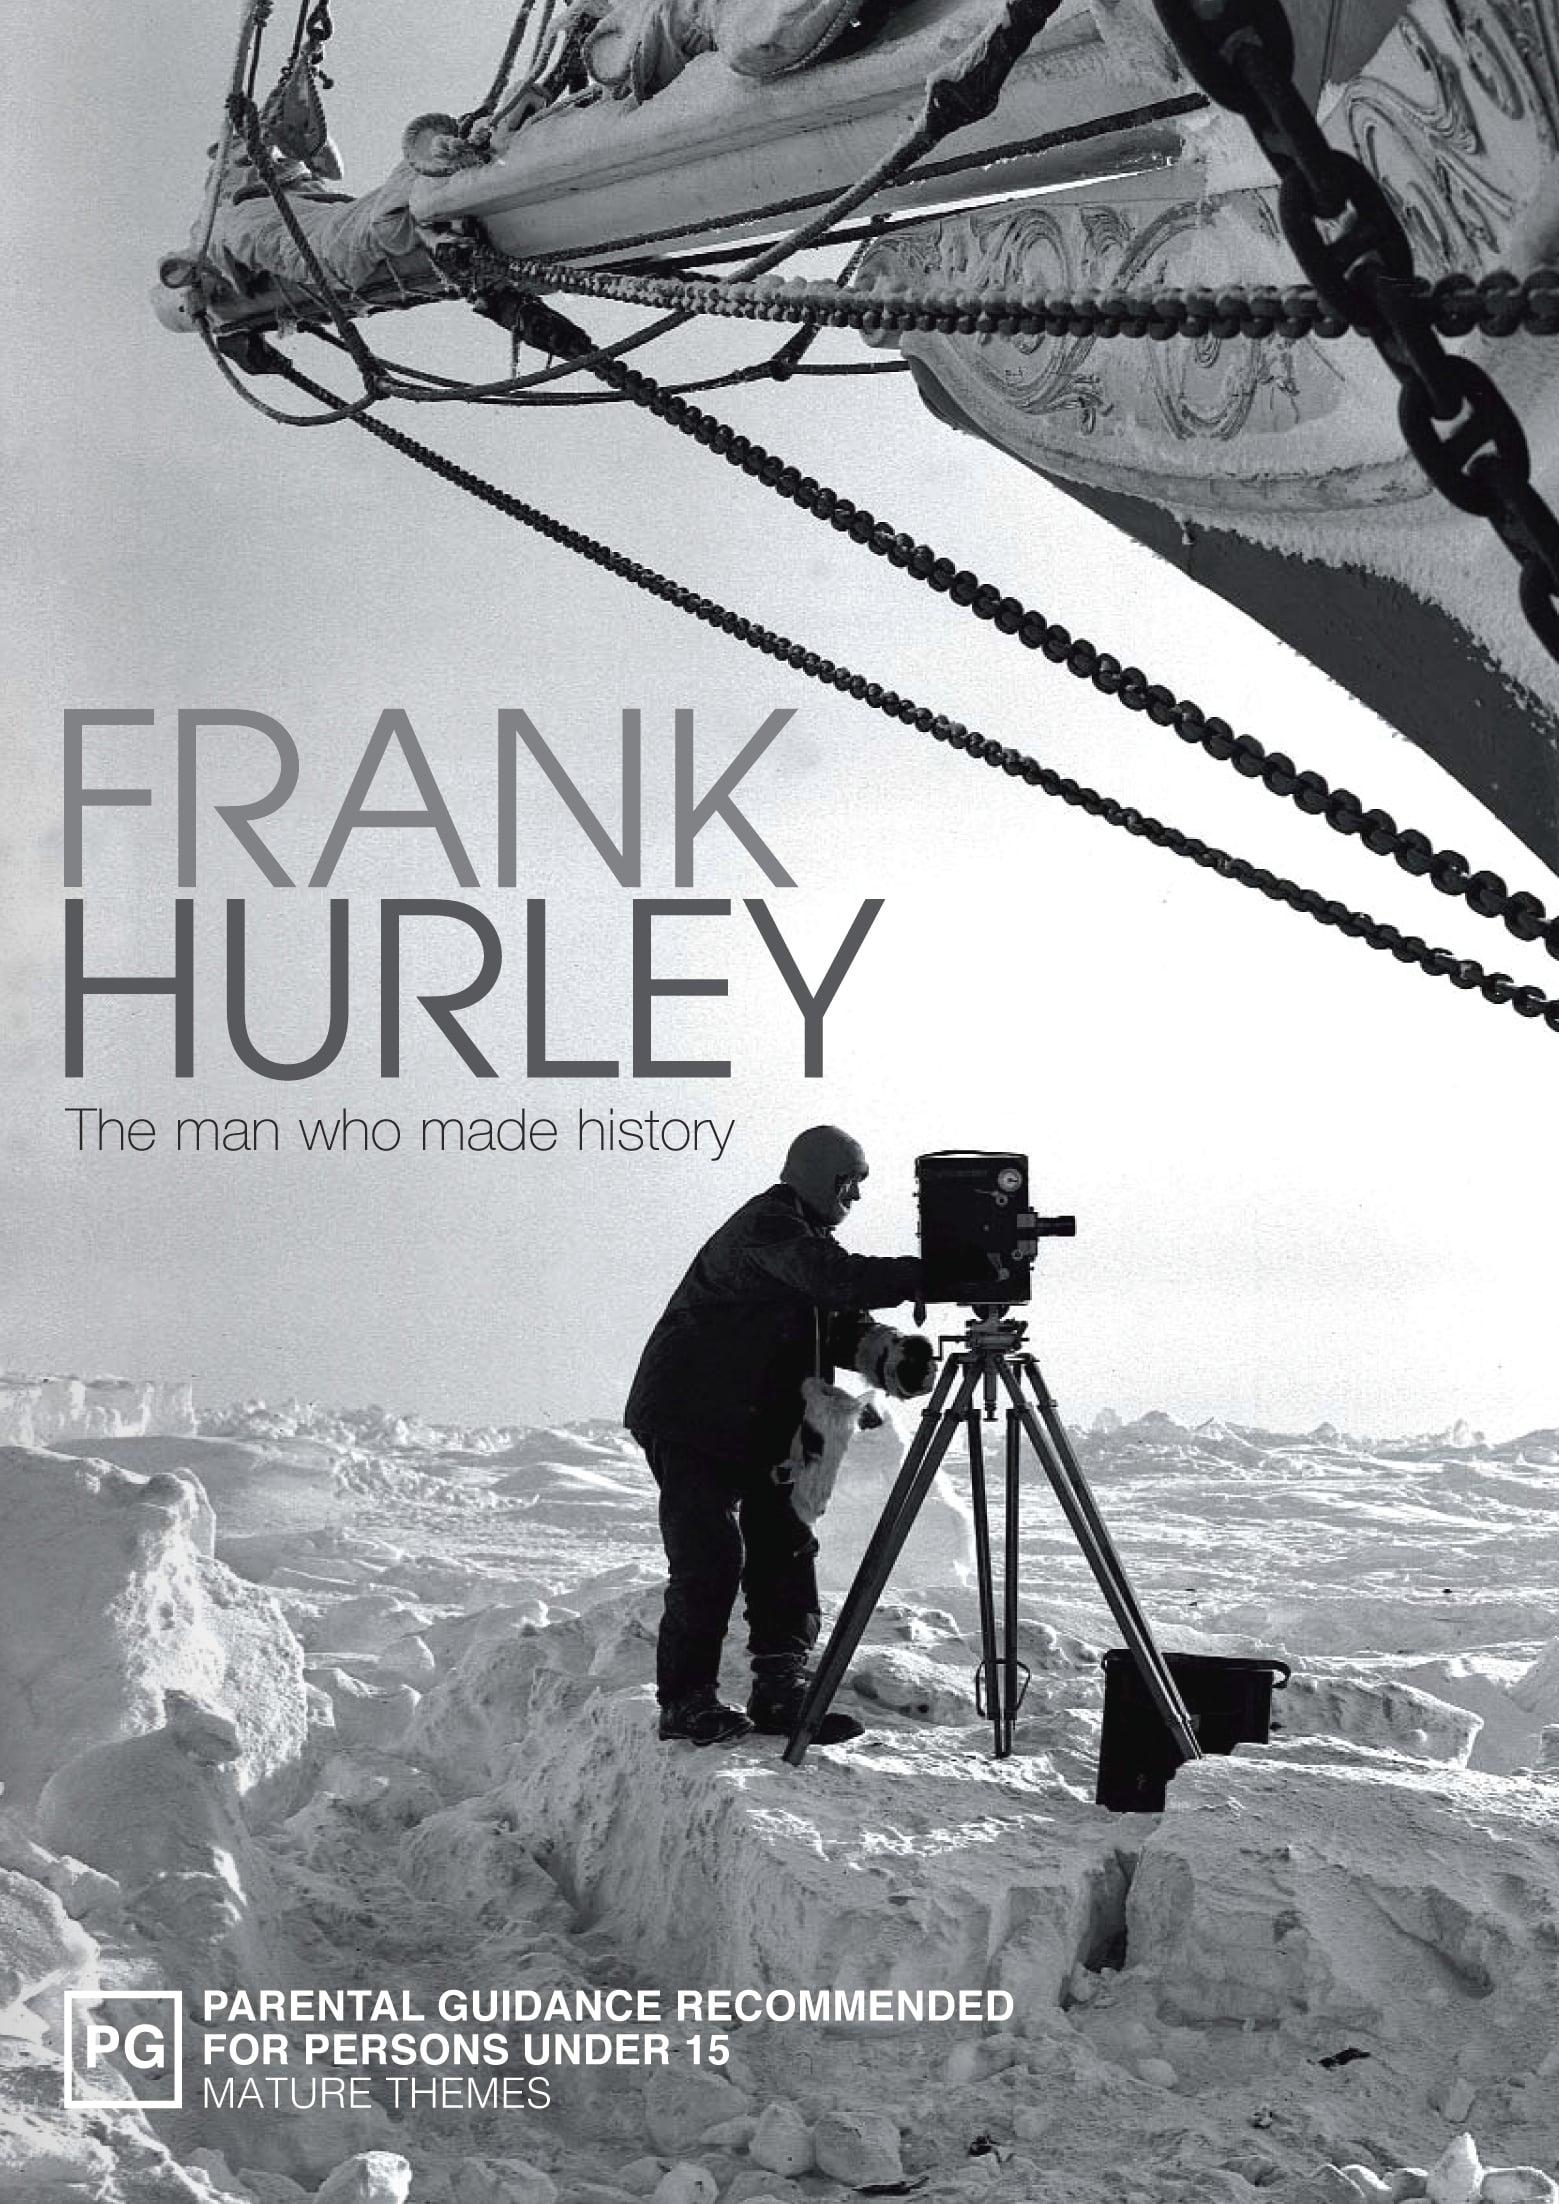 Frank Hurley: The Man Who Made History